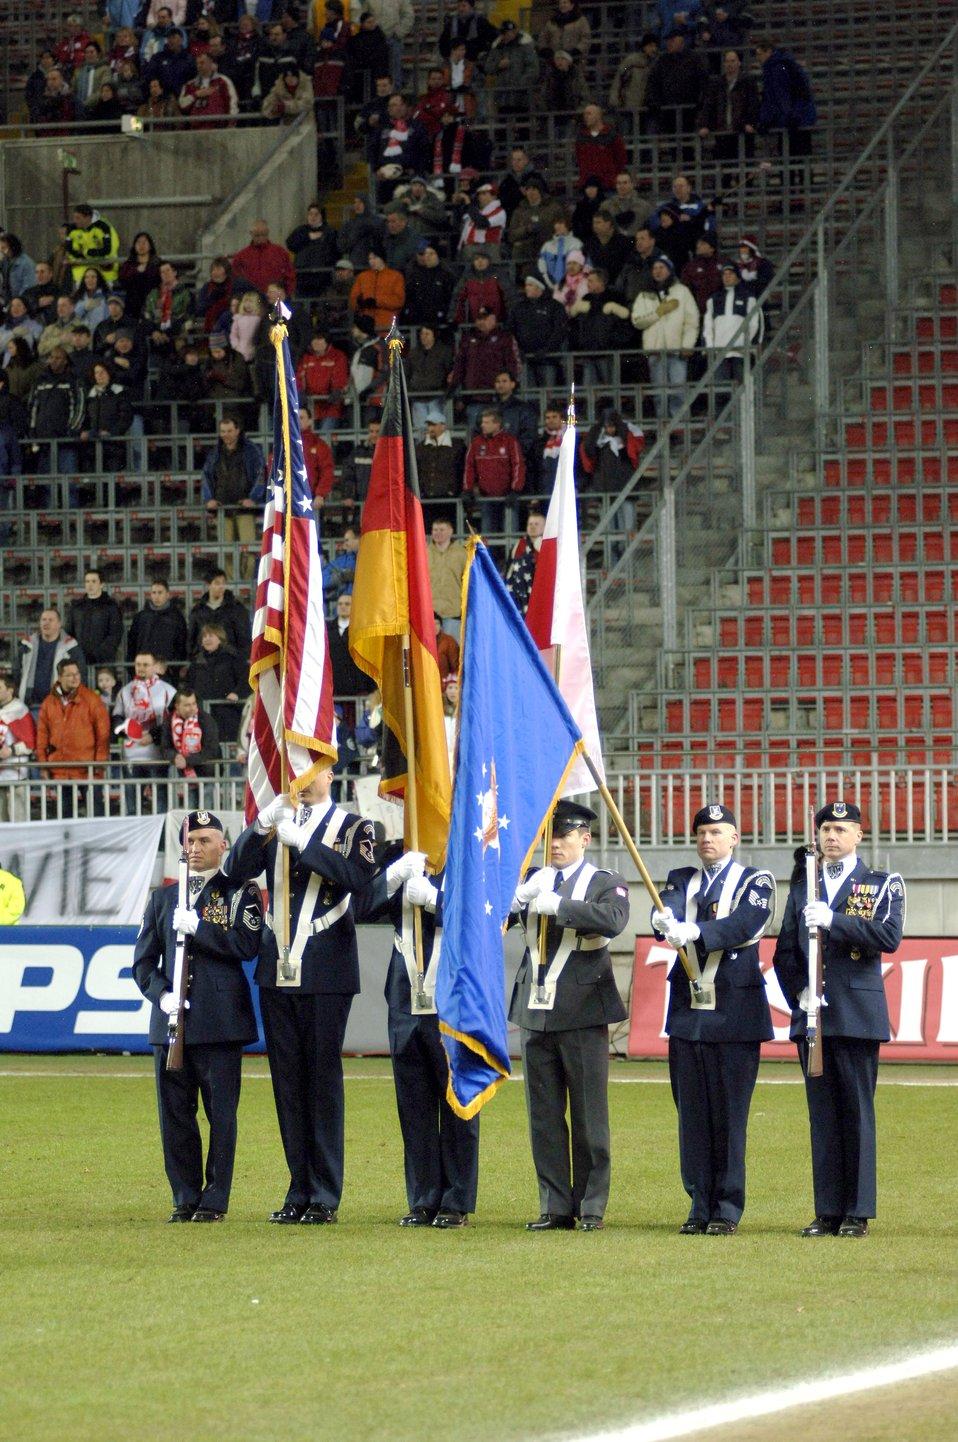 U.S. Men's National Soccer Team match